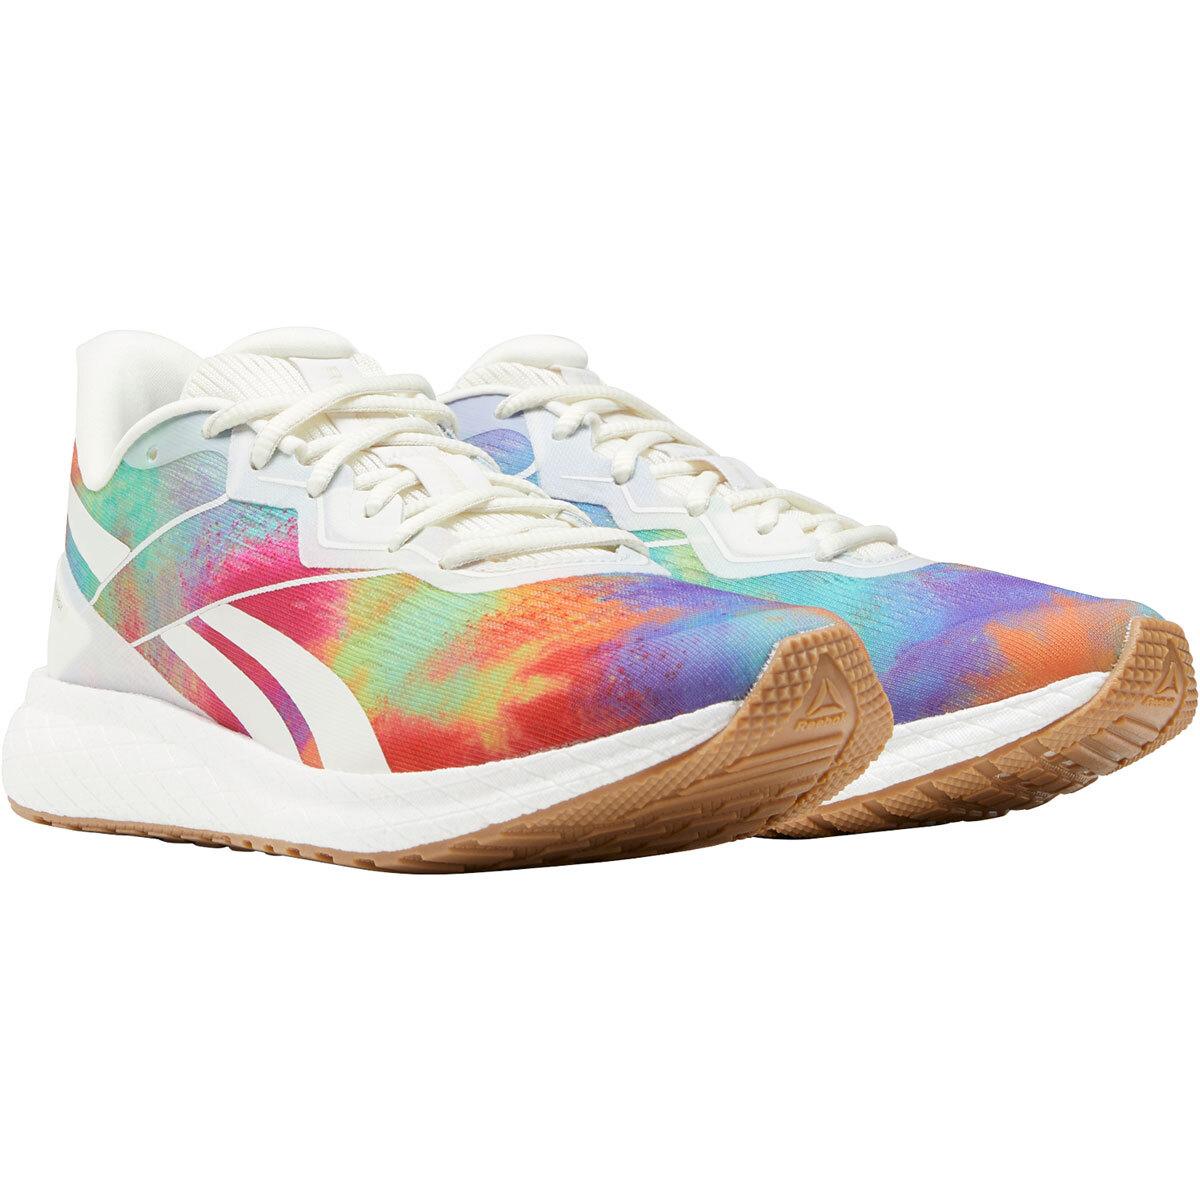 Women's Reebok Forever Floatride Energy 2.0 Running Shoe - Color: Pride - Size: 5 - Width: Regular, Pride, large, image 4